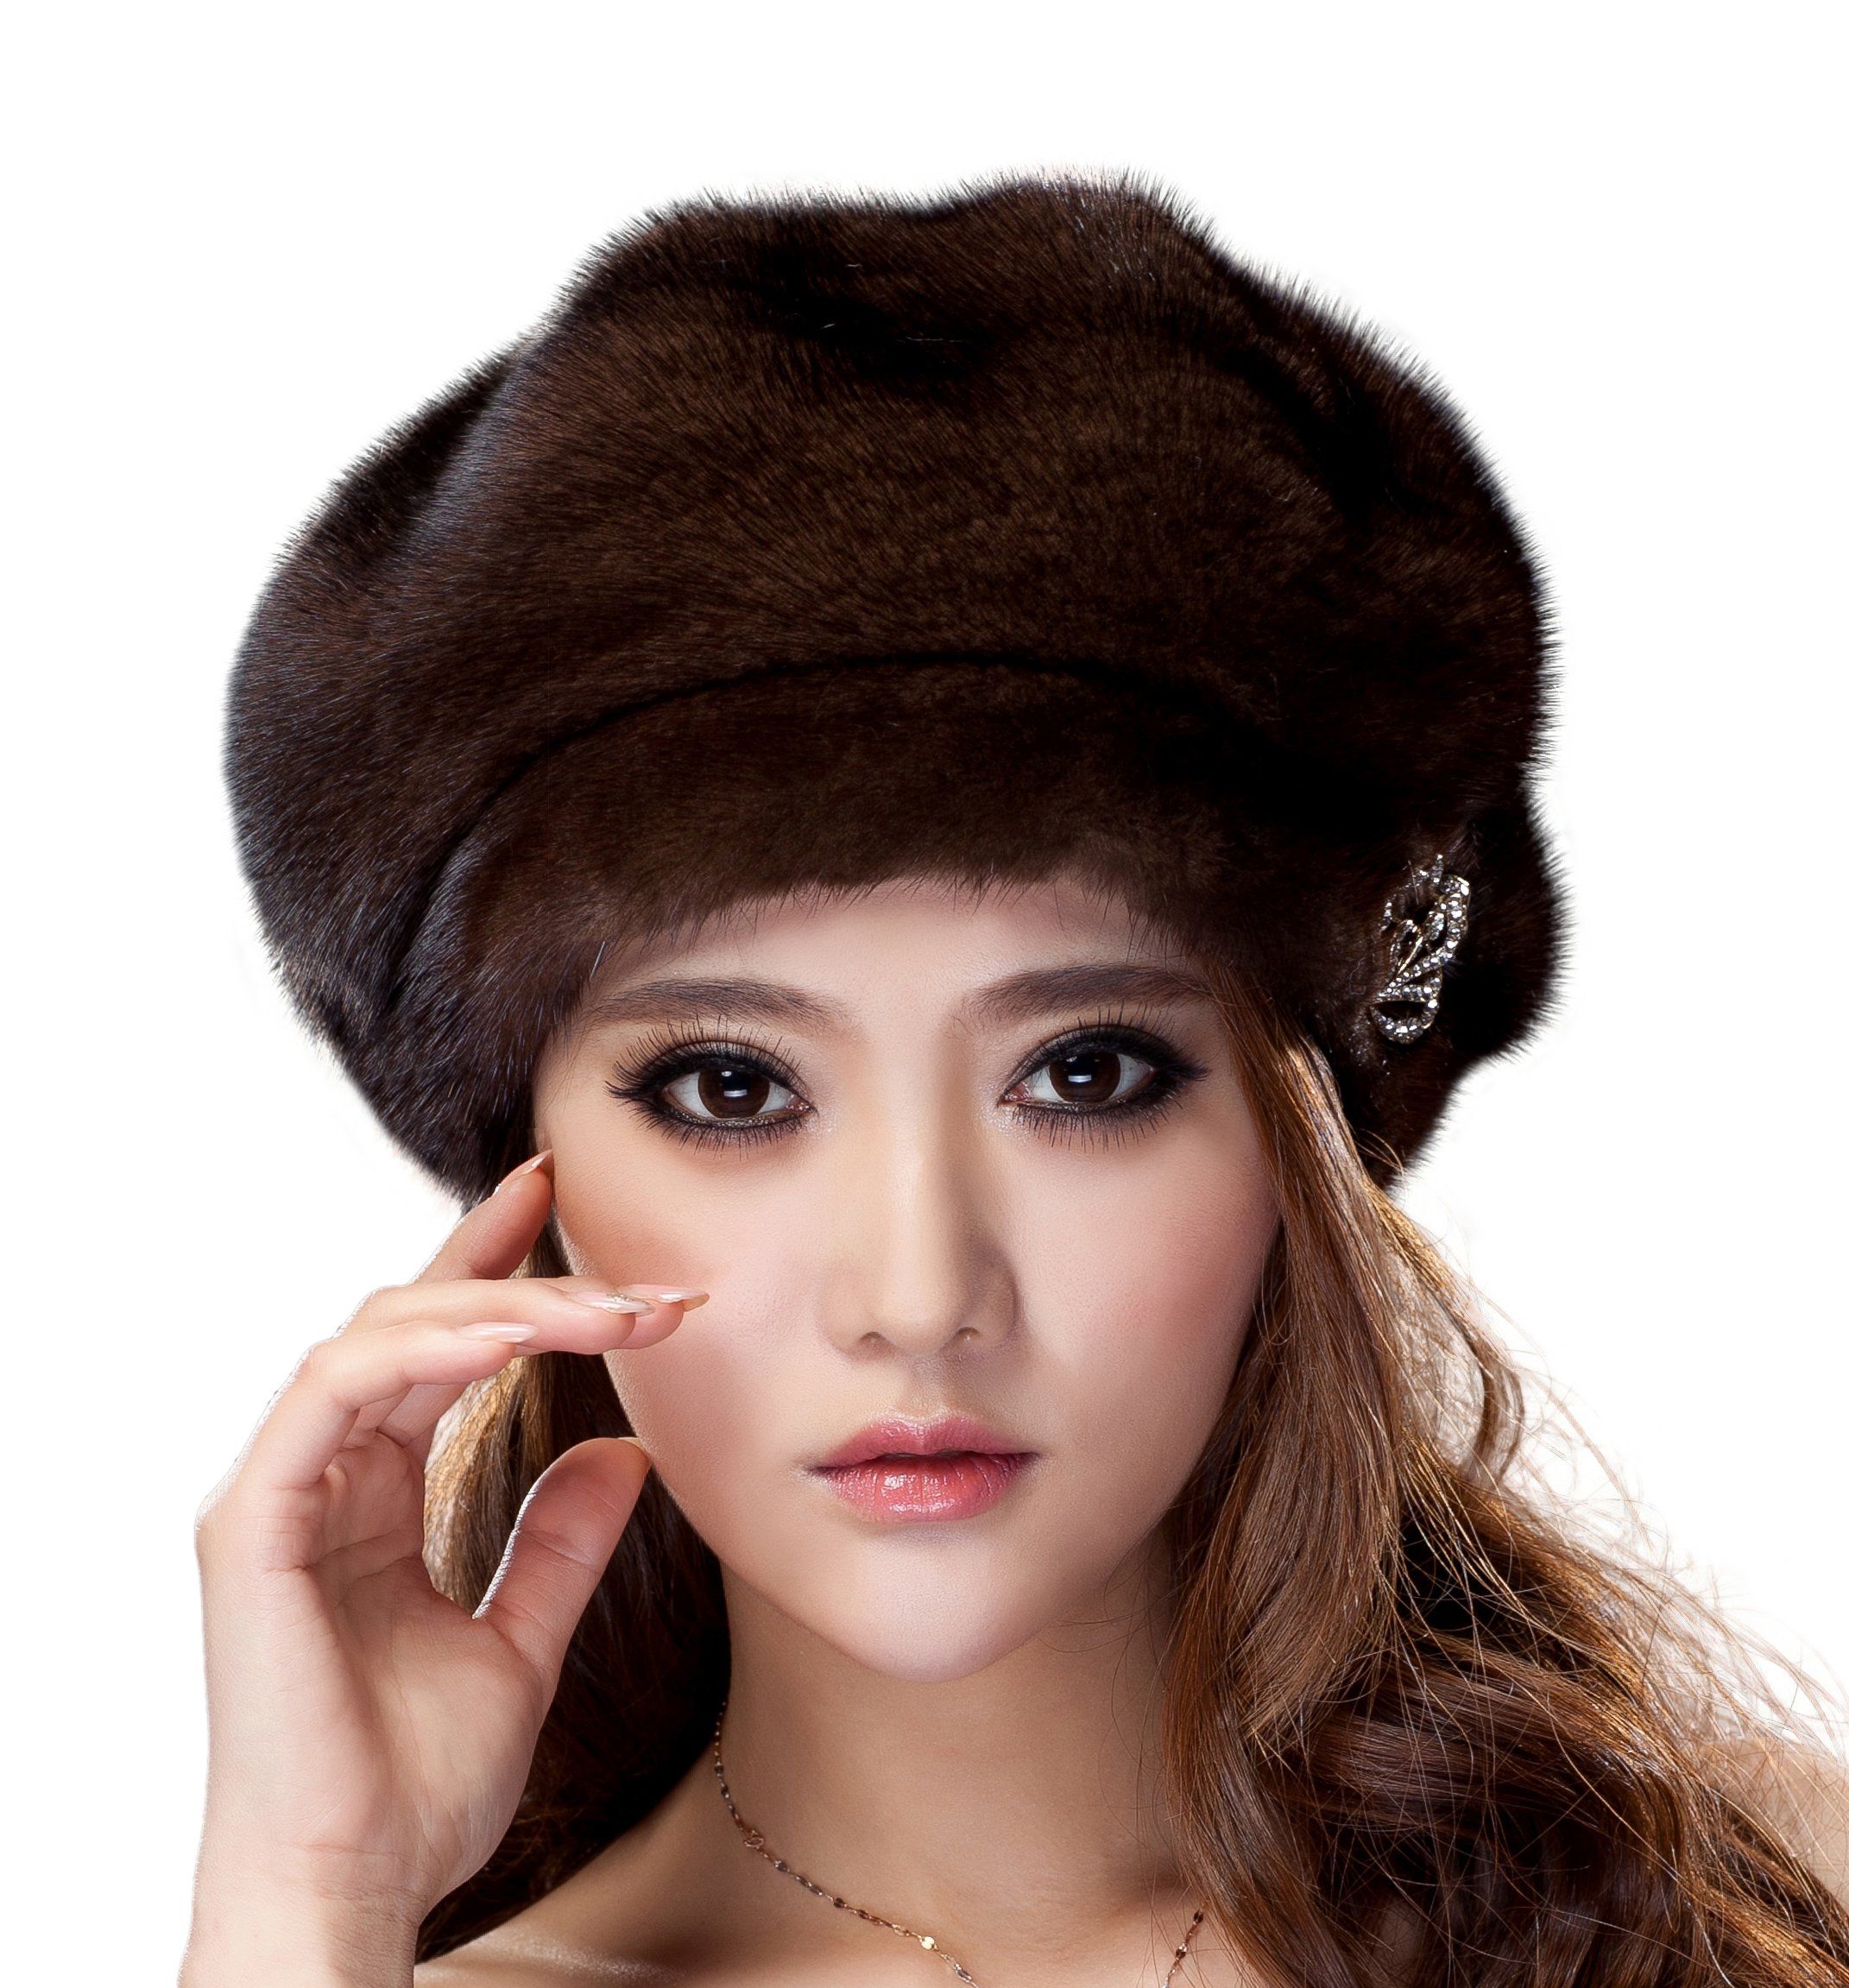 URSFUR Ladier Mink Full Fur Beret Hats (Brown) by URSFUR